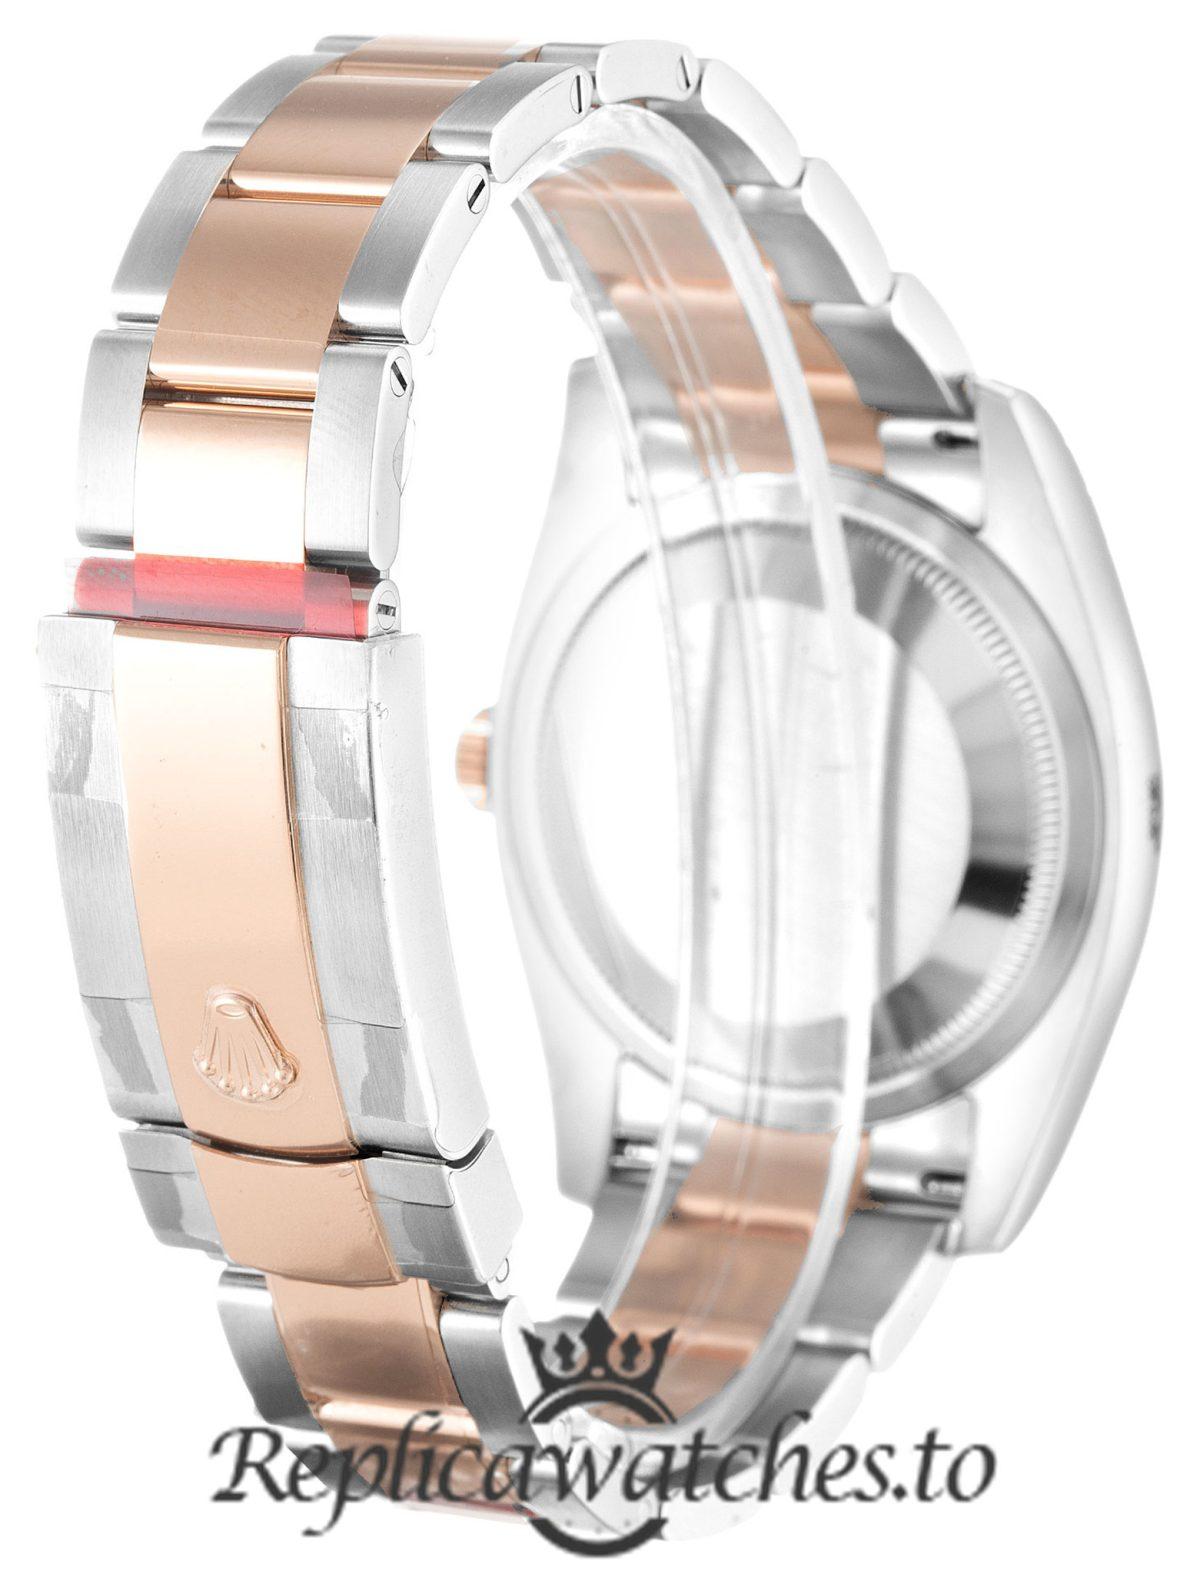 Rolex Datejust Replica 116201 Rose Gold Bezel 36MM